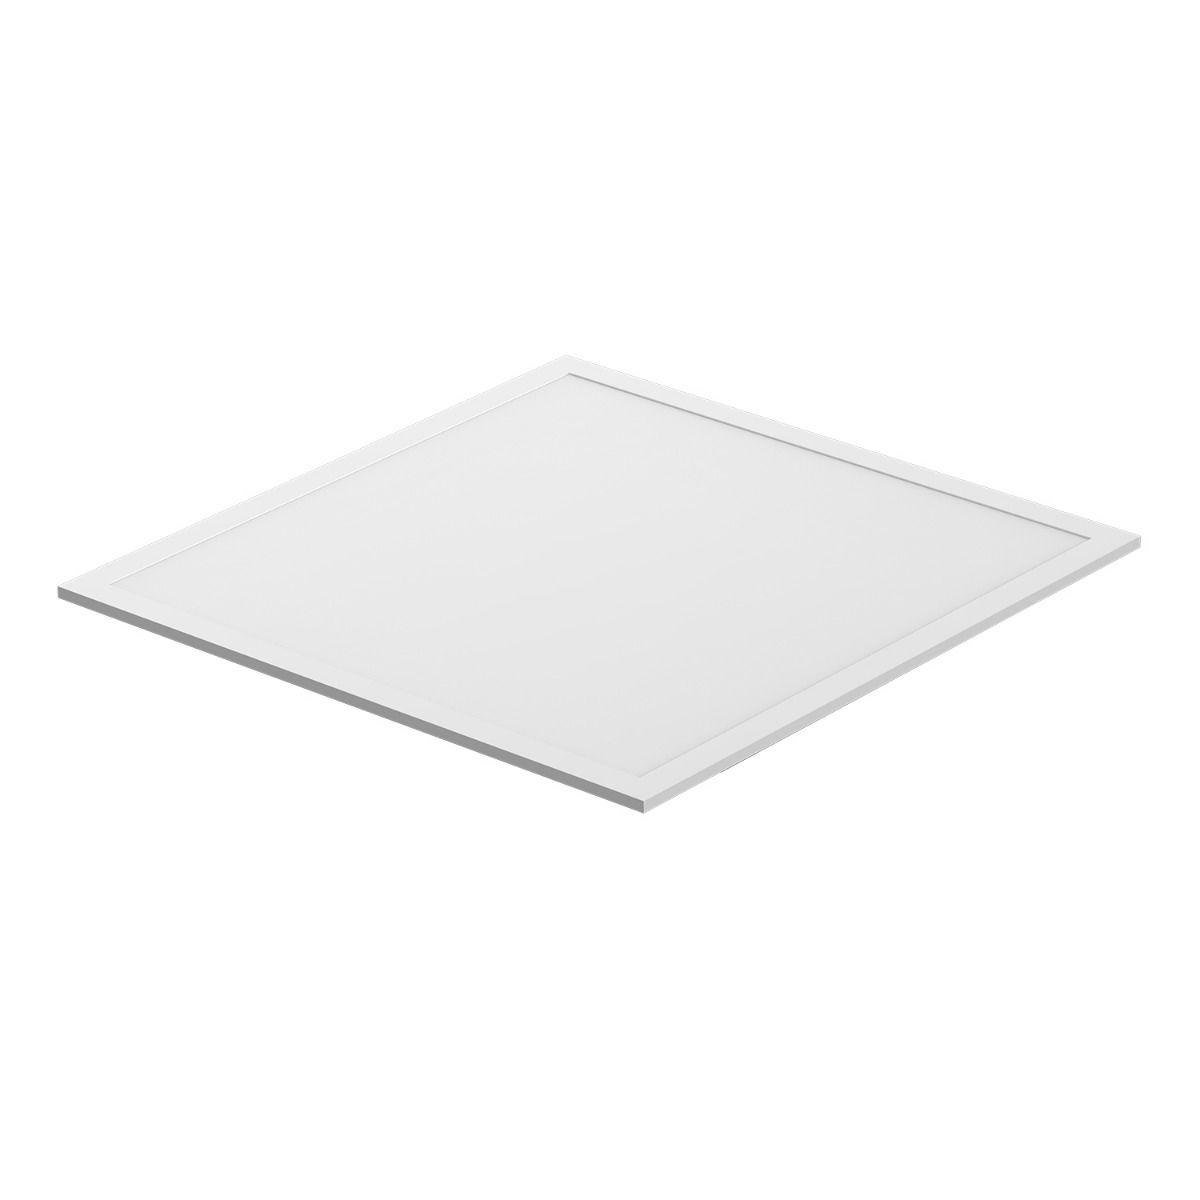 Noxion LED Panel Delta Pro Highlum V2.0 Xitanium DALI 40W 60x60cm 3000K 5280lm UGR <19 | Dali Dimmbar - Warmweiß - Ersatz für 4x18W